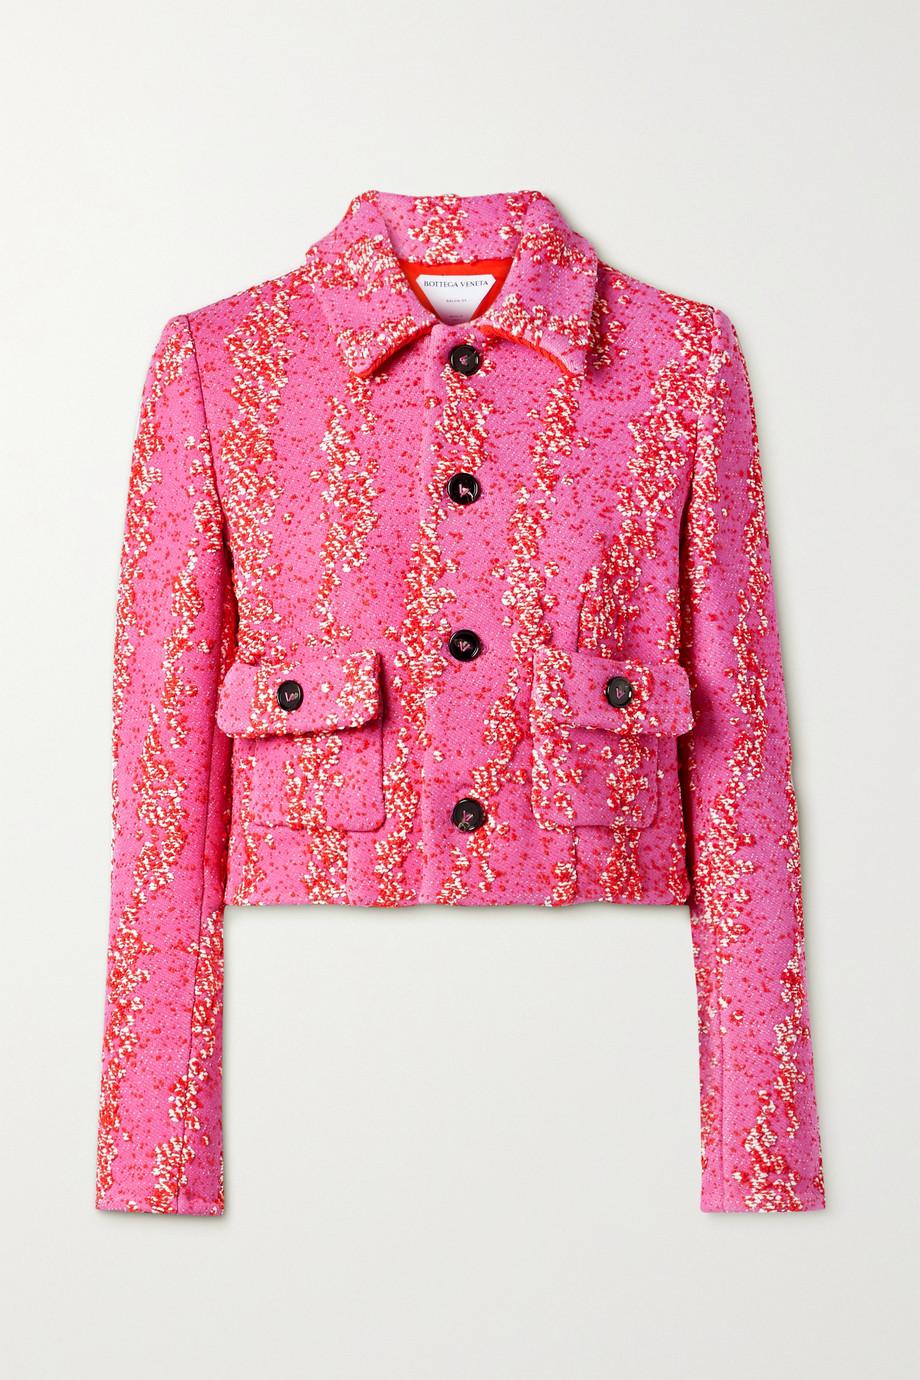 Bottega Veneta Cropped bouclé jacket